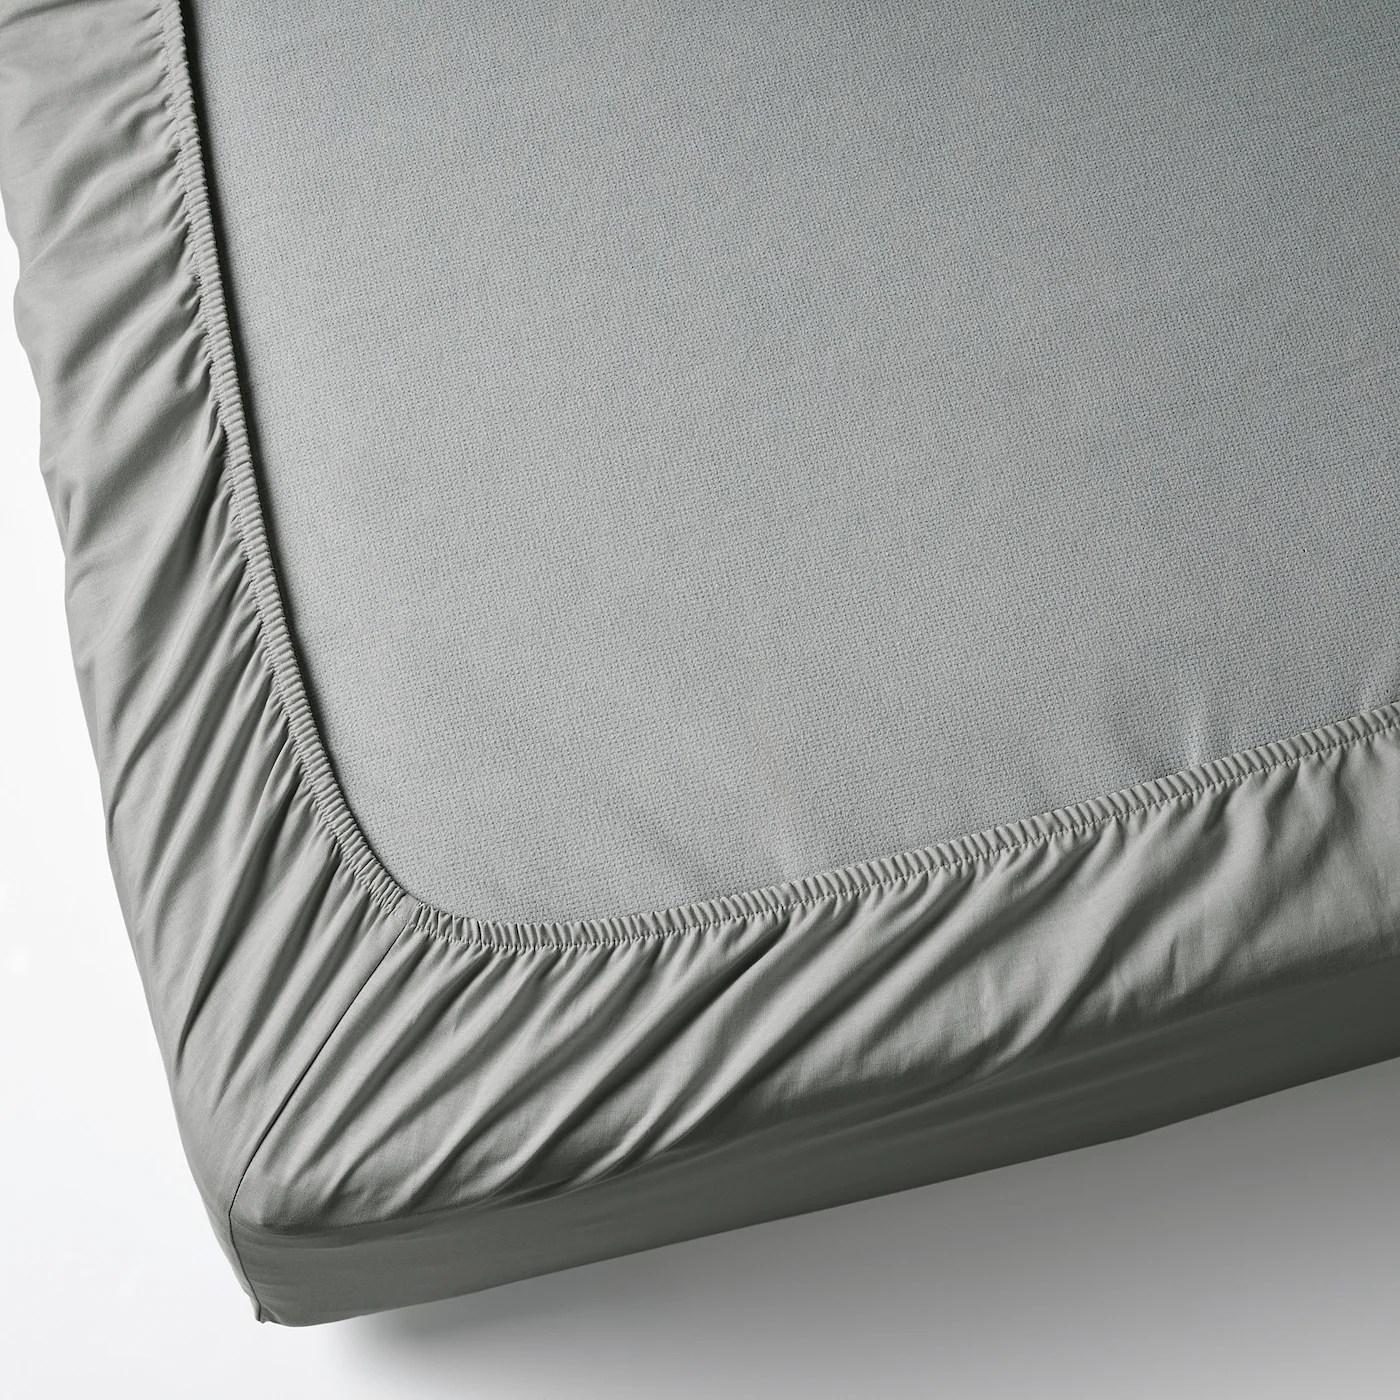 Dvala Drap Housse Gris Clair 90x200 Cm Materiau Durable Ikea